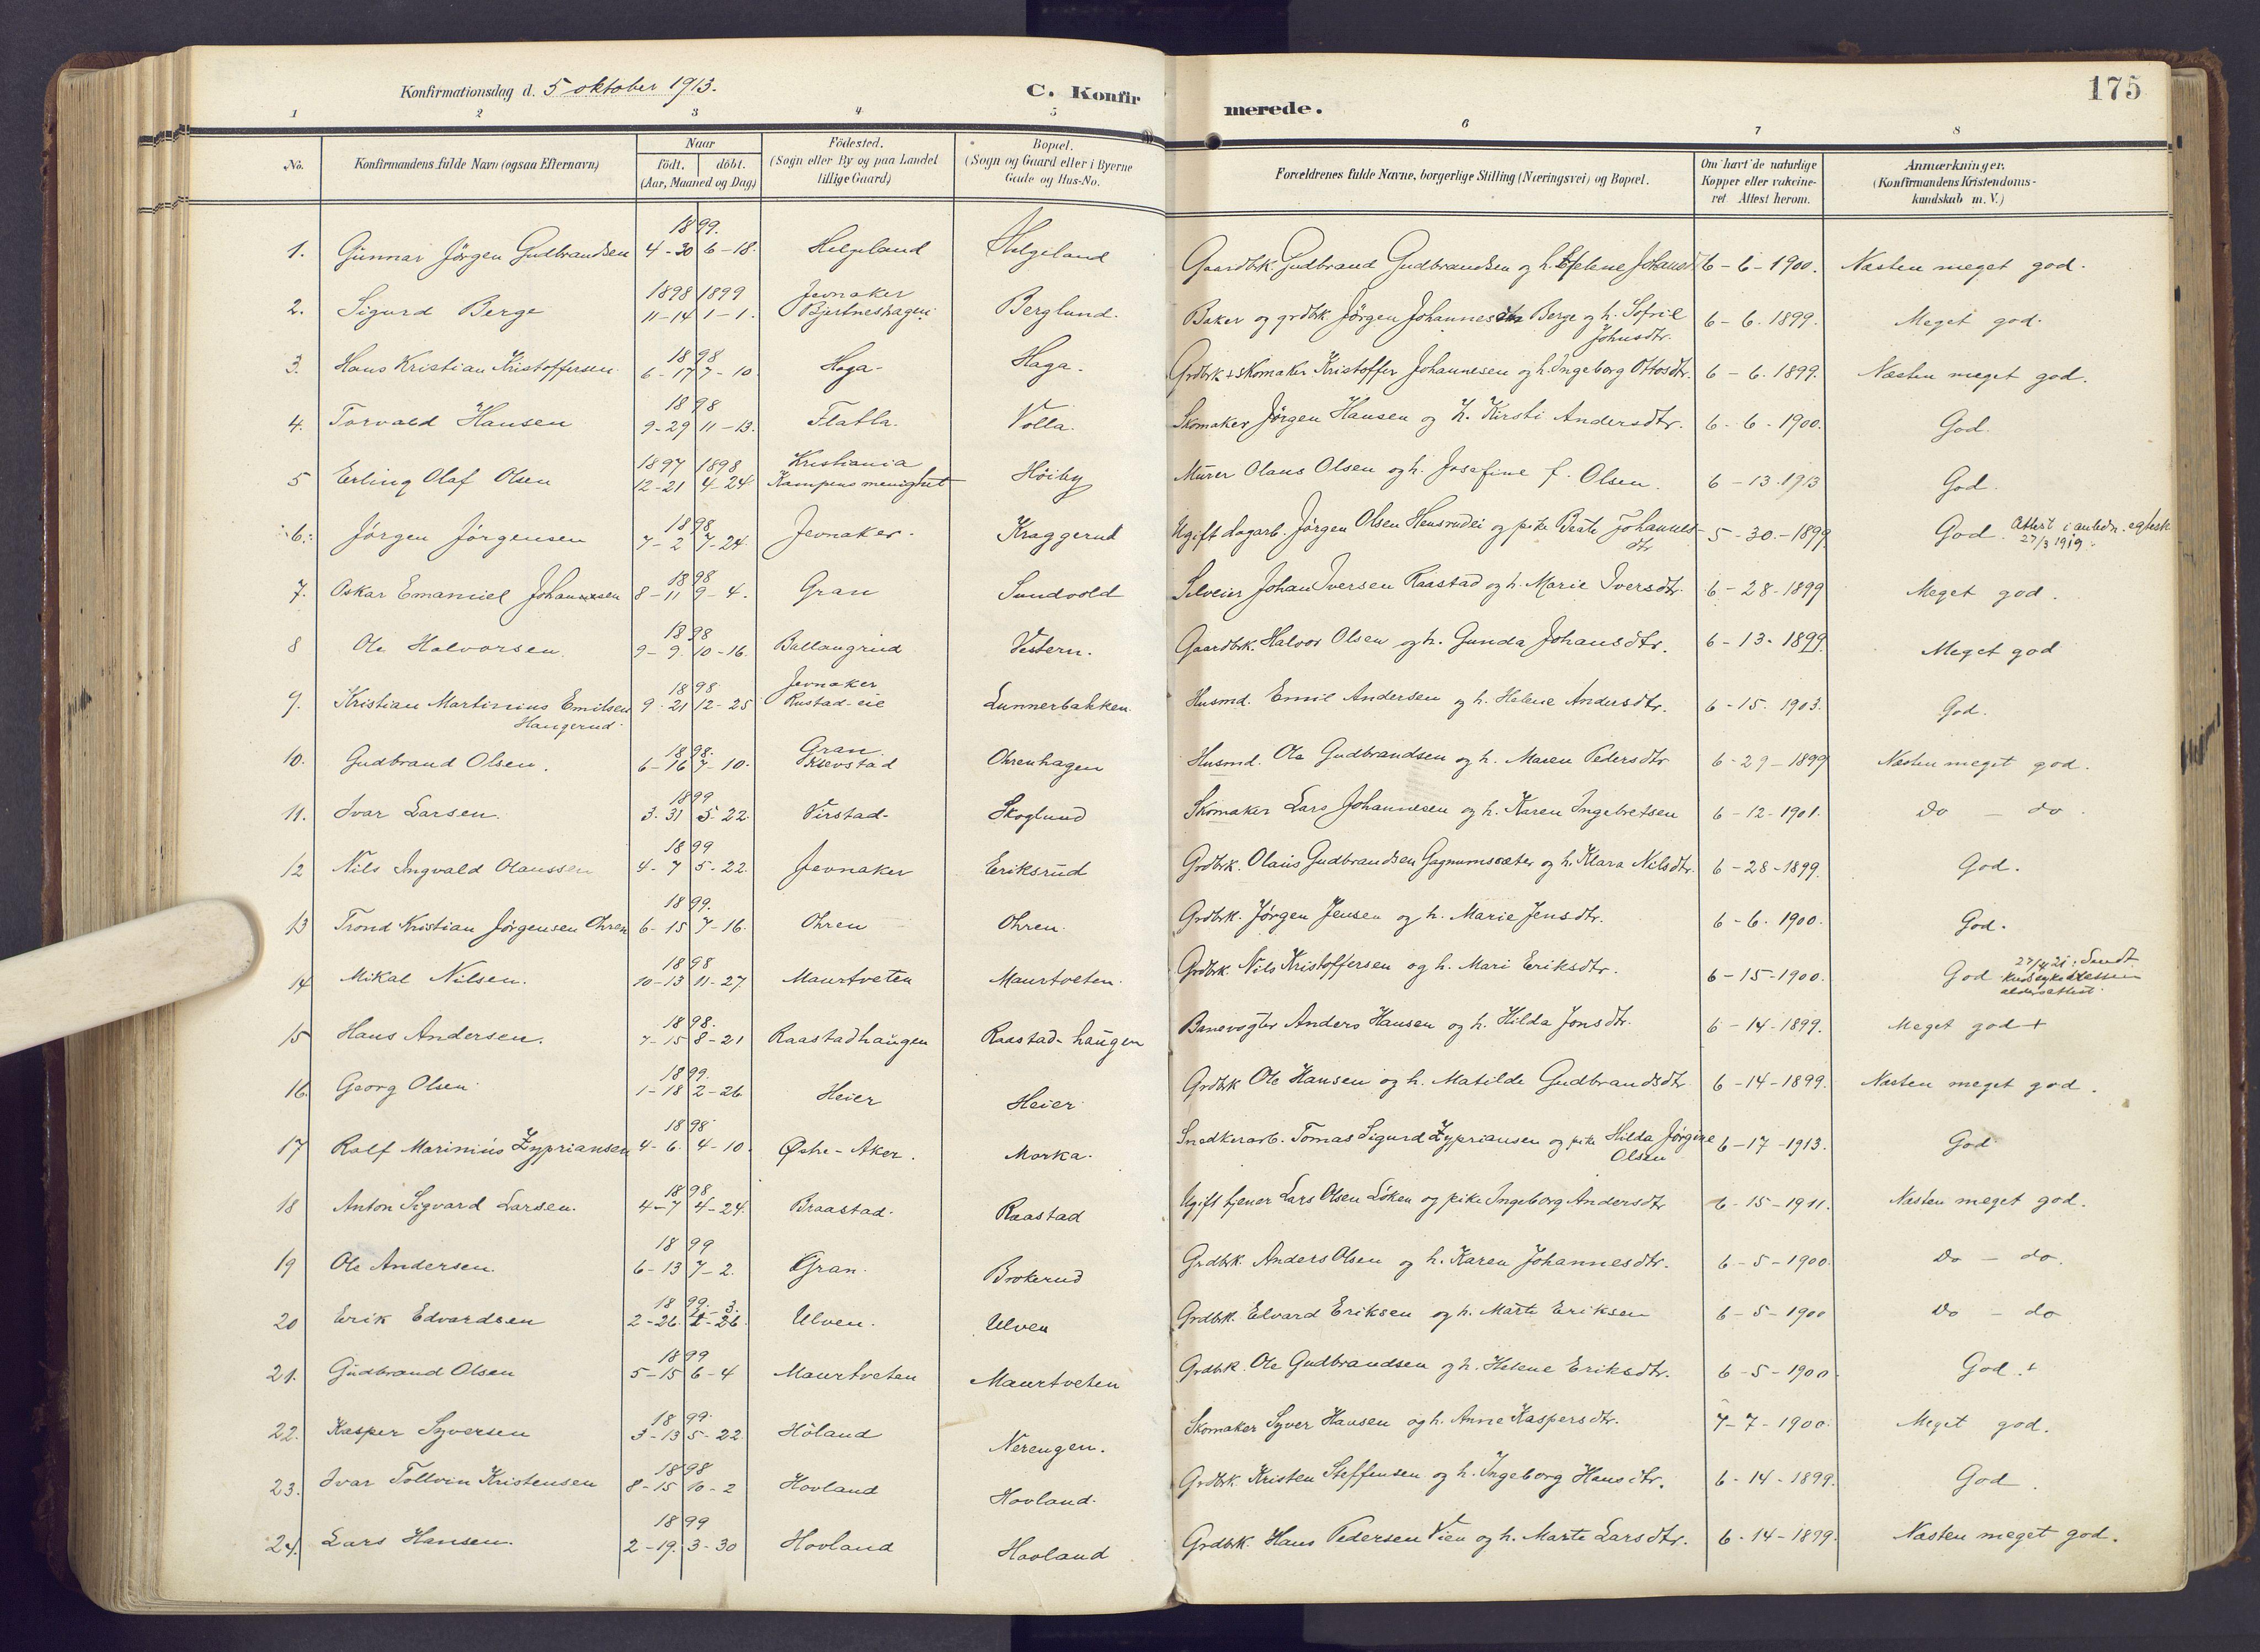 SAH, Lunner prestekontor, H/Ha/Haa/L0001: Ministerialbok nr. 1, 1907-1922, s. 175